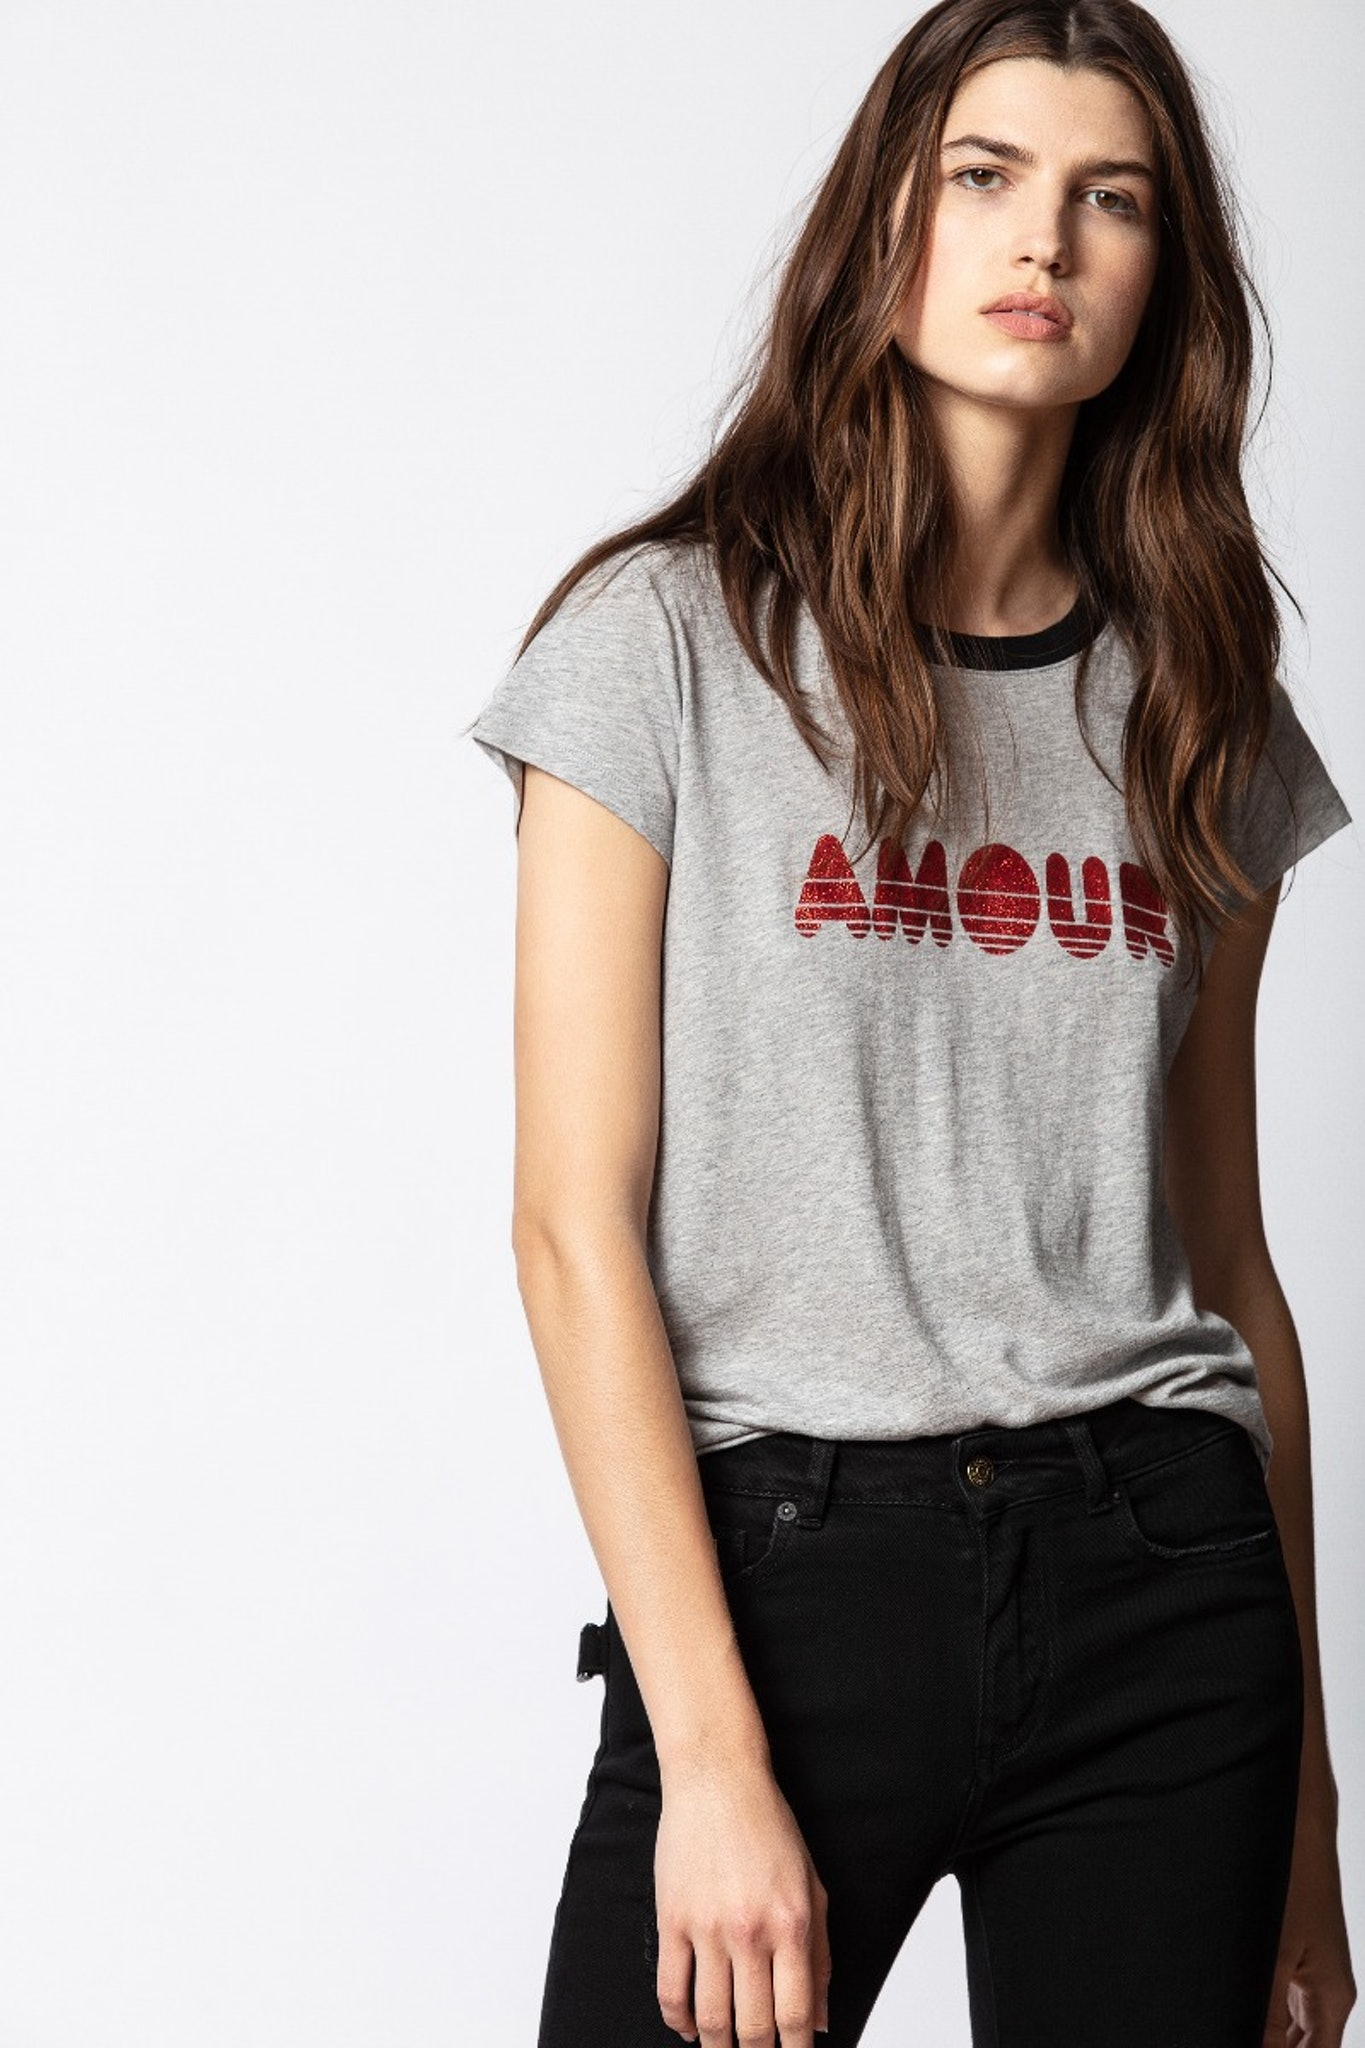 Camiseta Woop Amour 70